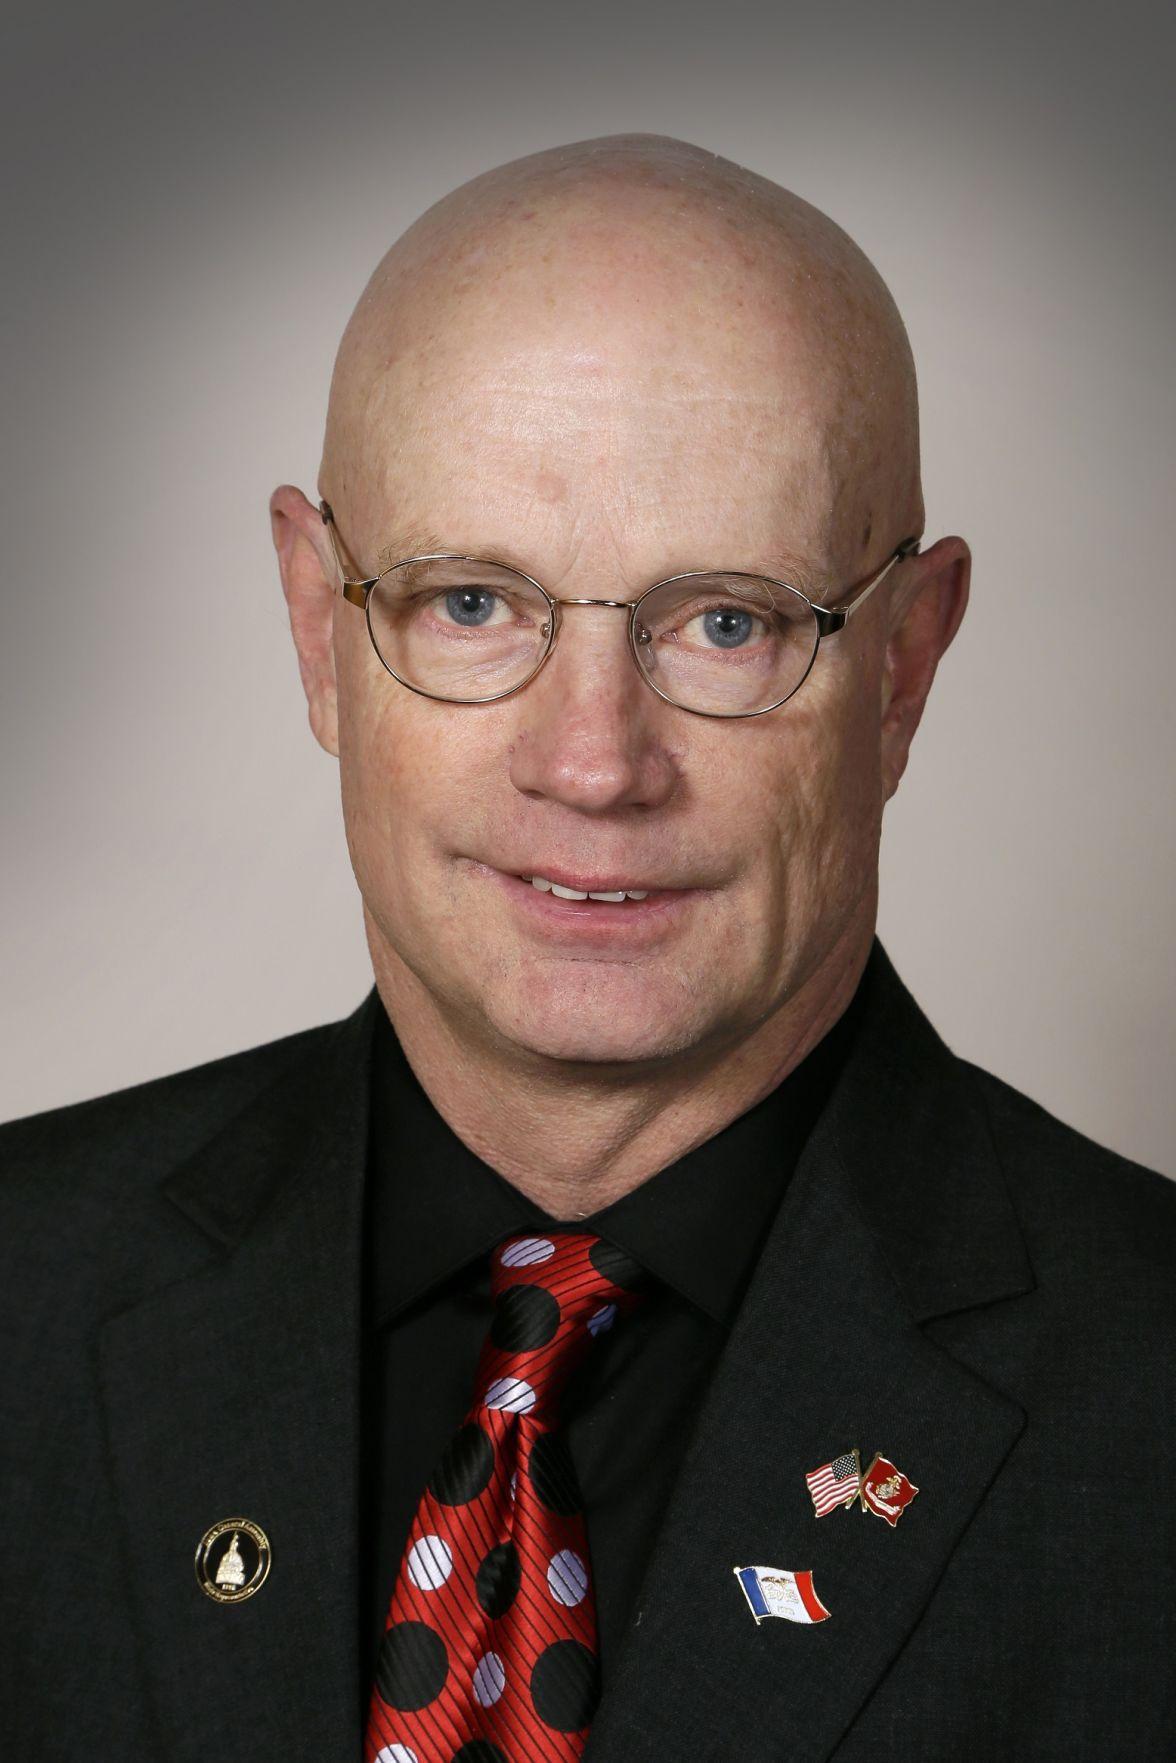 Iowa state Rep. Steve Holt